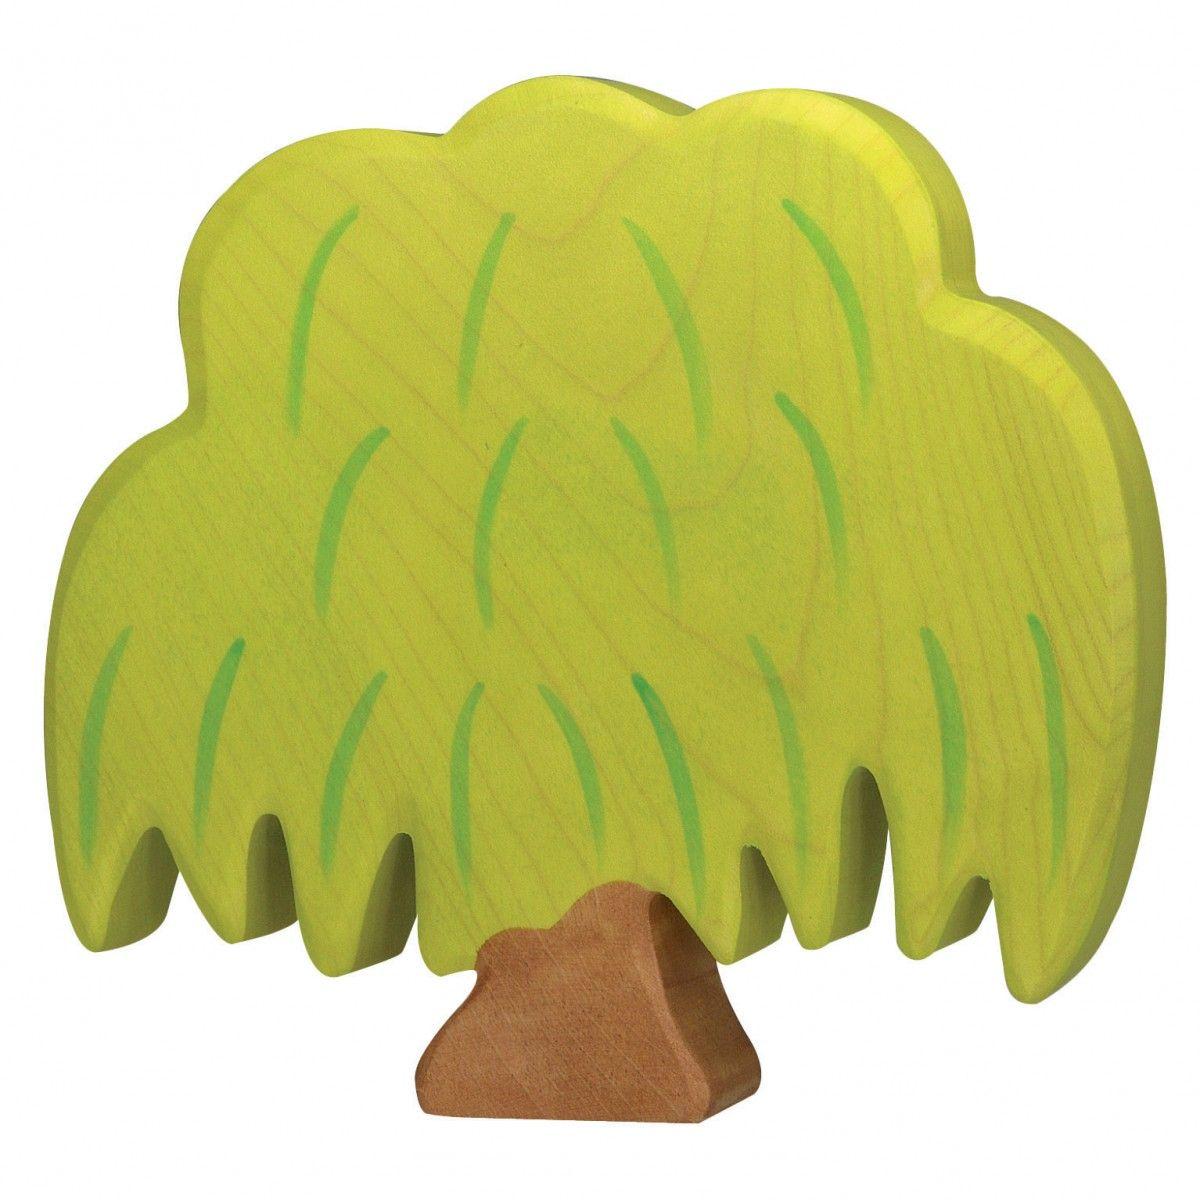 Wooden tree waldorf toy puzzle Oak & acorn Toy Montessori